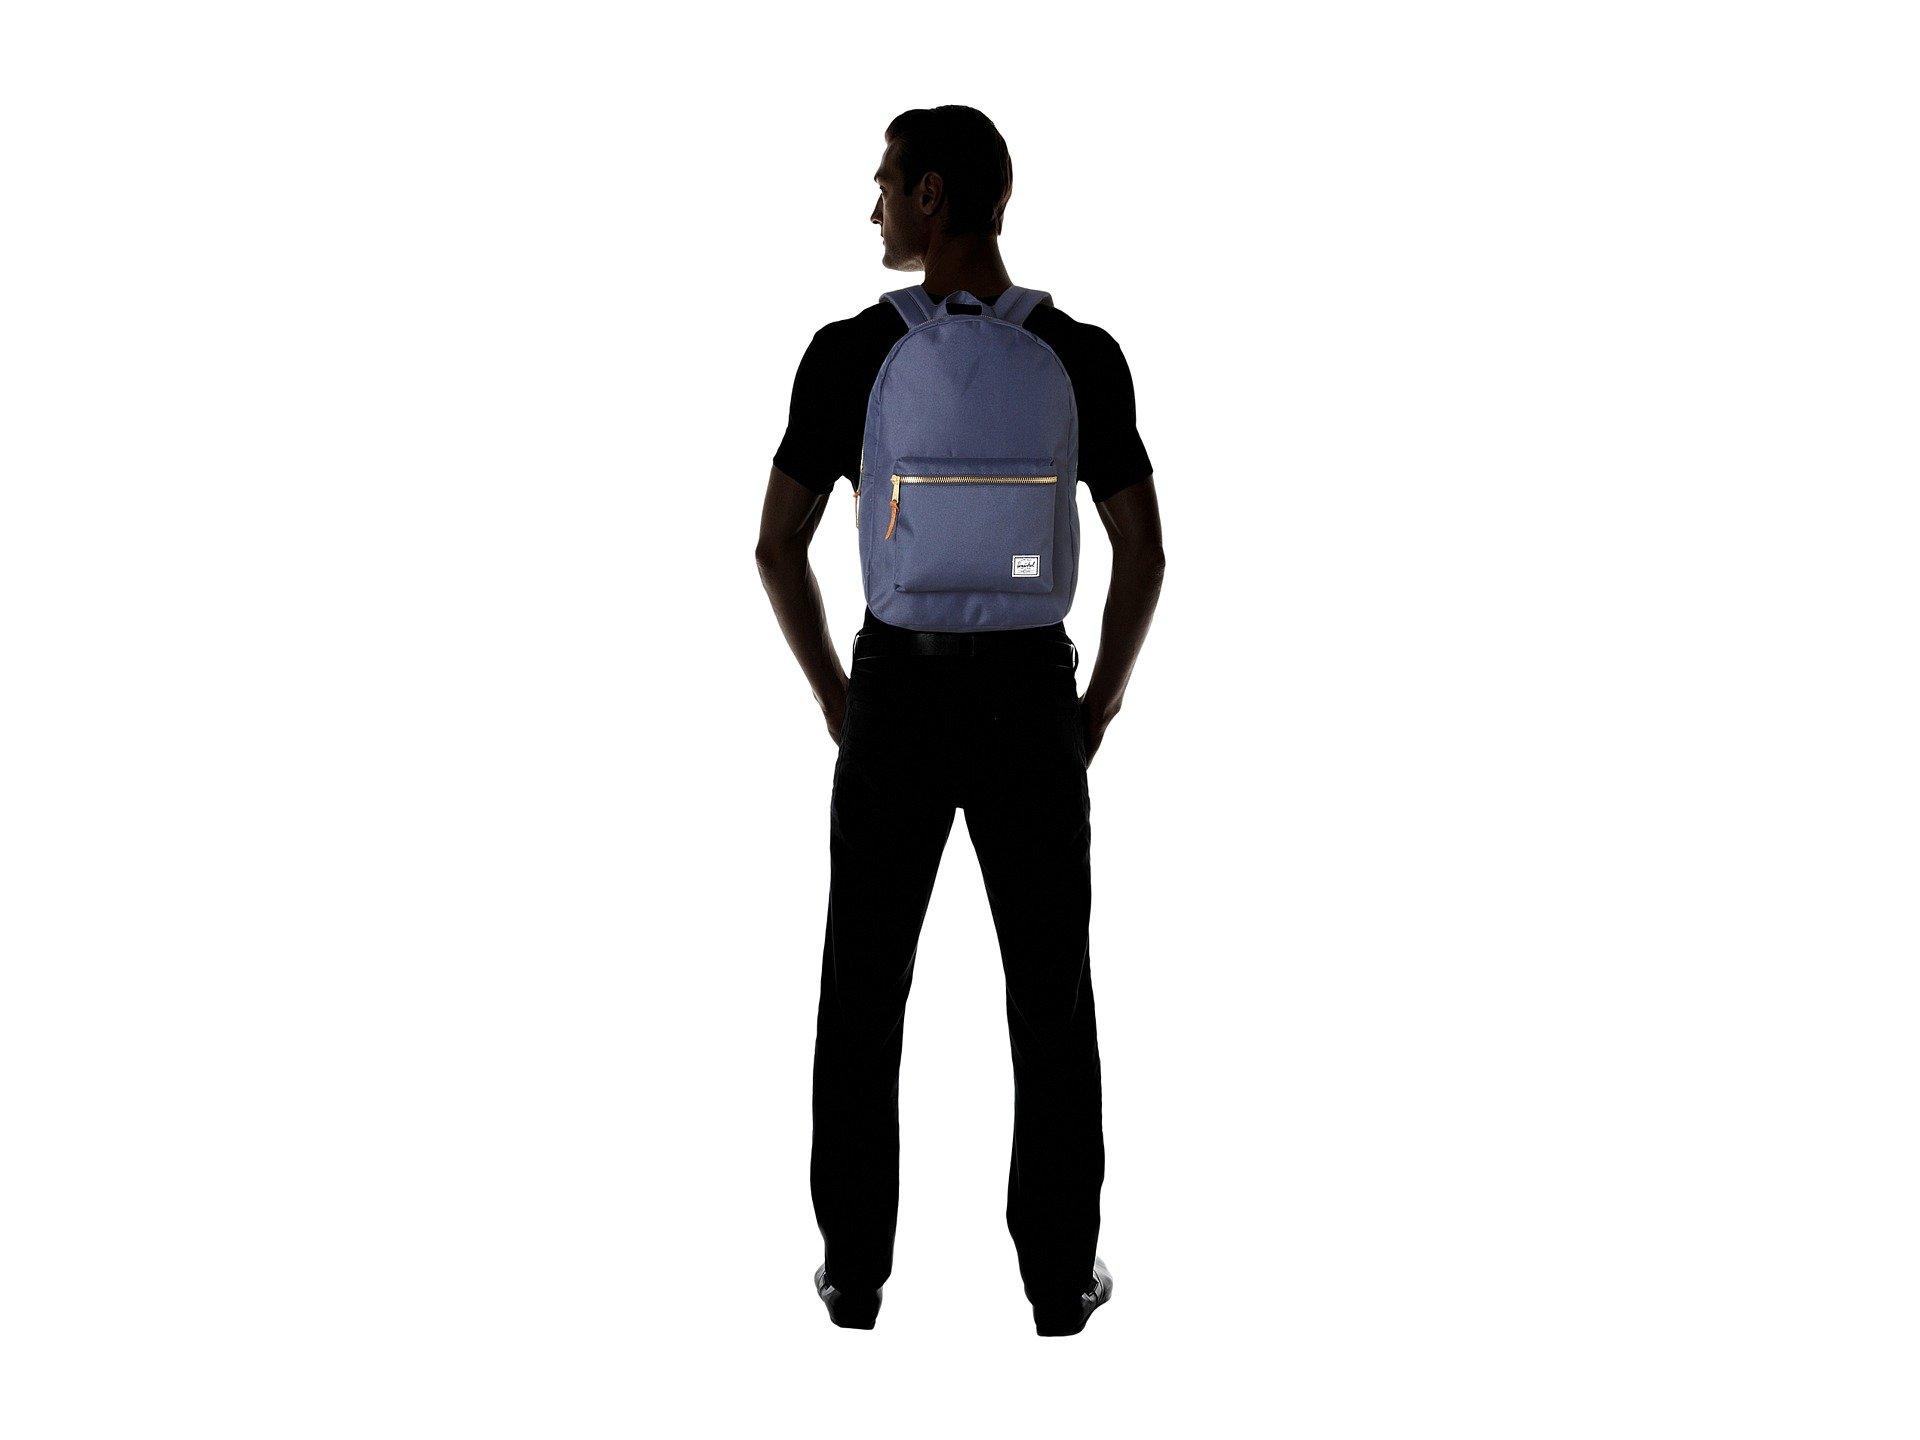 1920x1440 Herschel Supply Co. Men Settlement Classic Backpack Silhouette